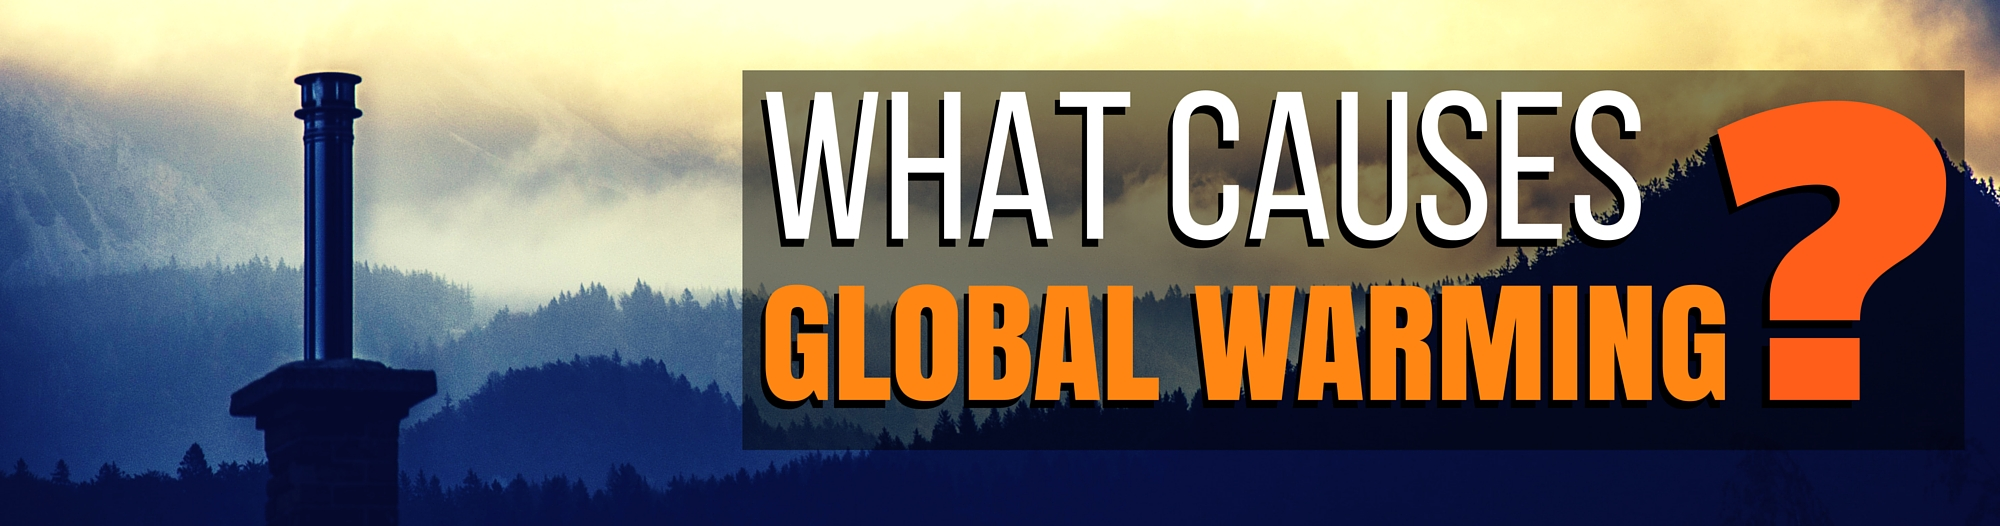 global-warming-causes